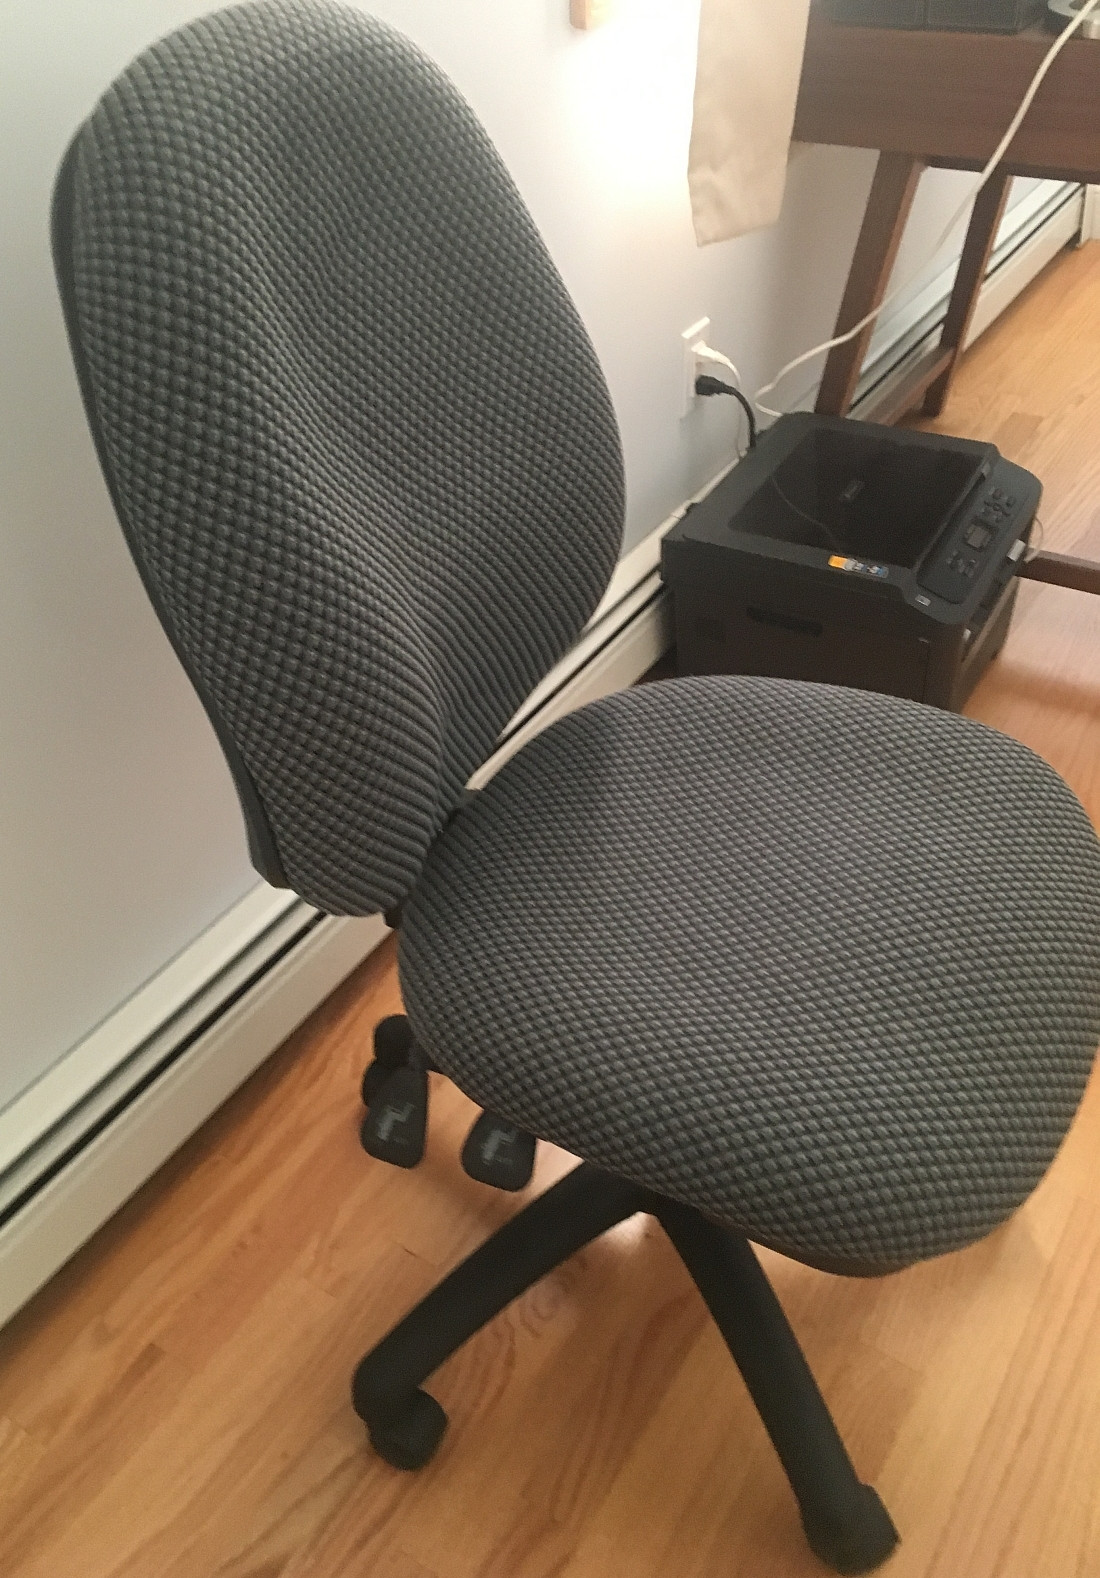 Office Chair w/ Padded Seat & Tilt Lock